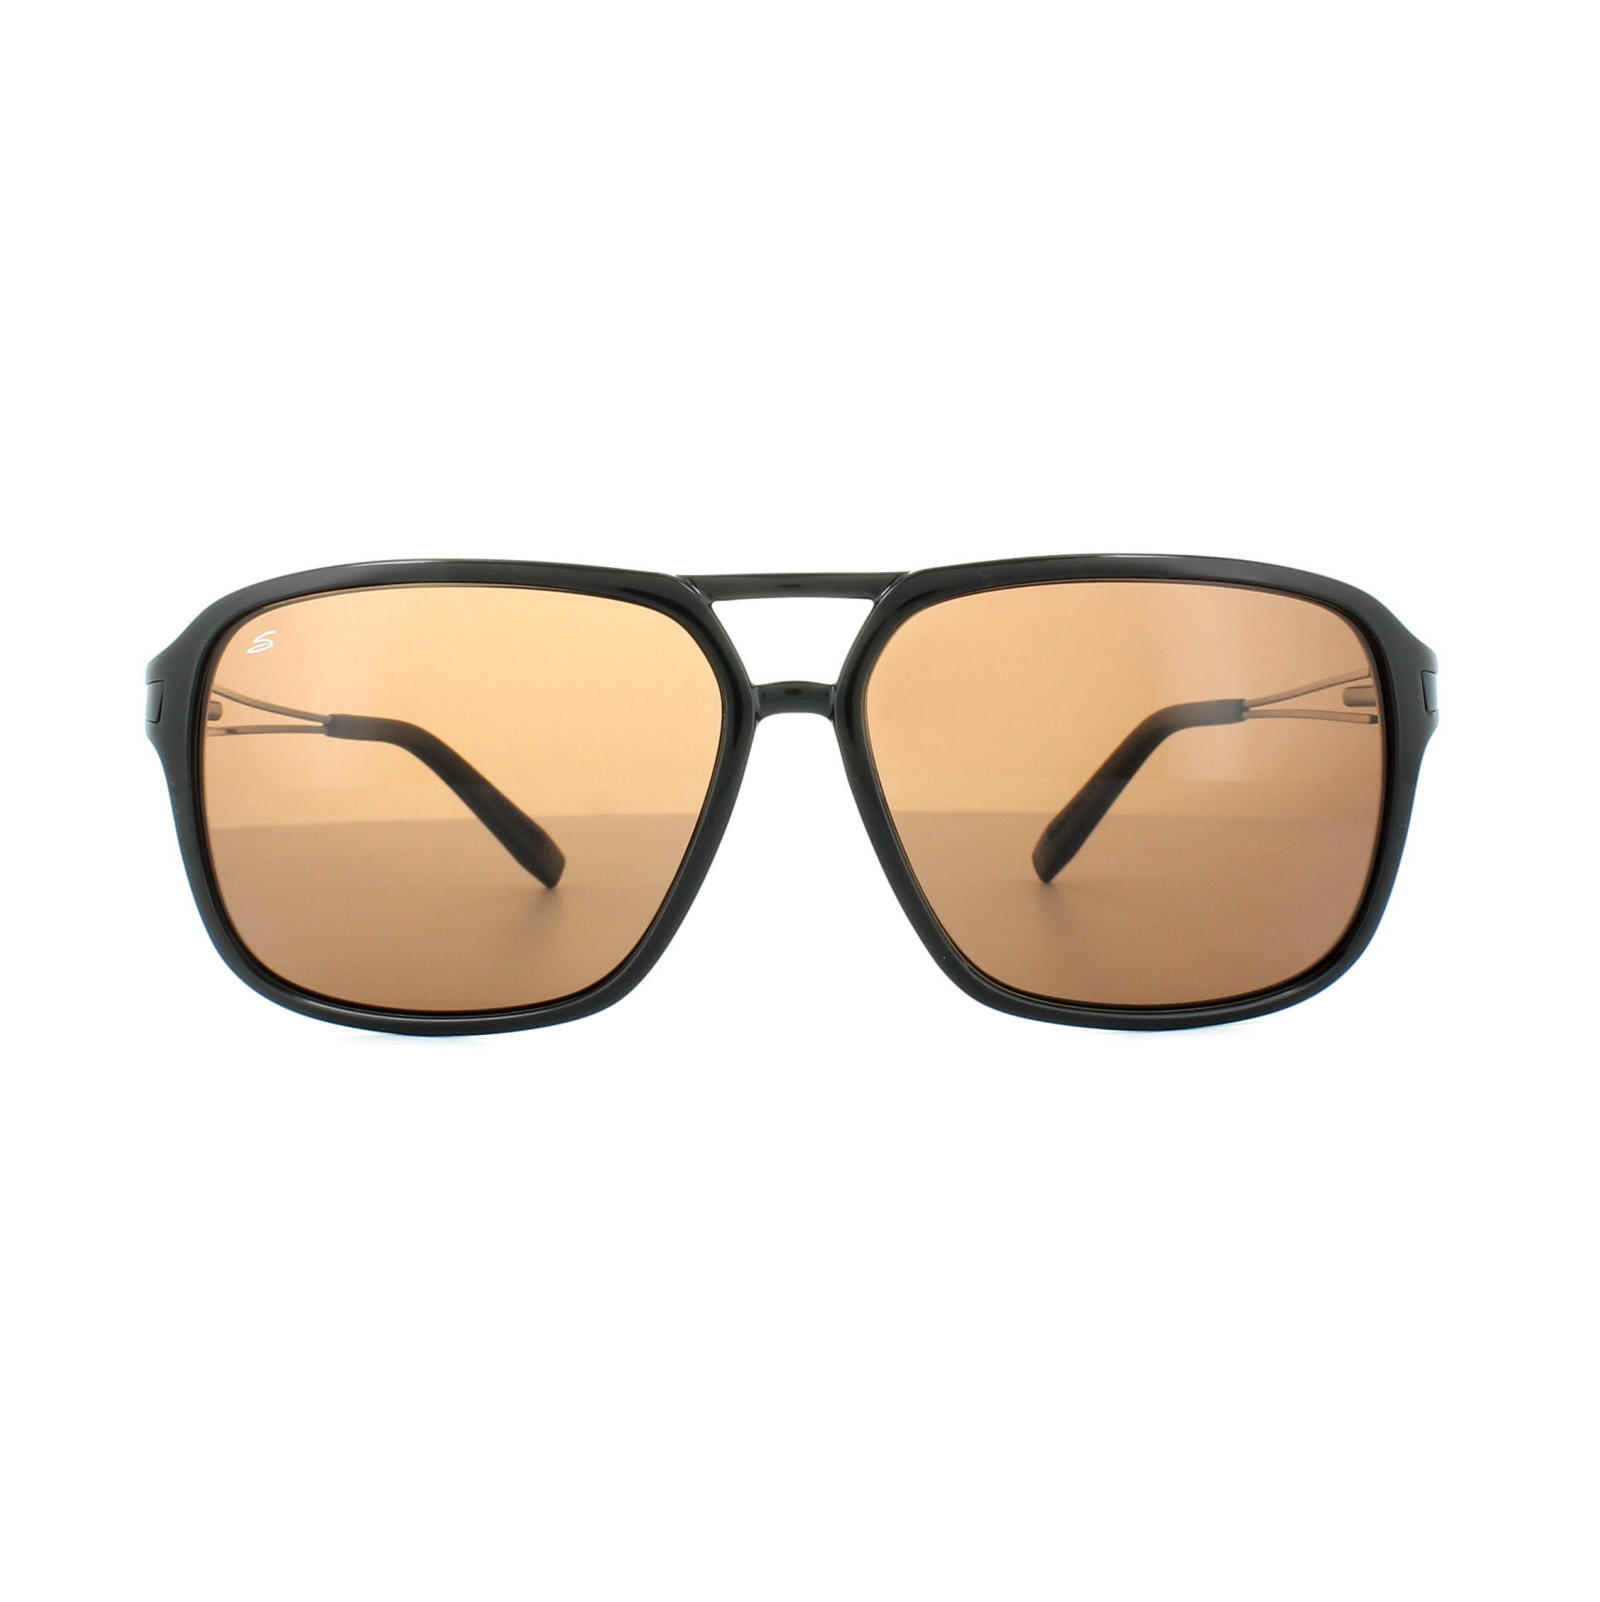 afc5ea9587 Sentinel Serengeti Sunglasses Venezia 8192 Shiny Black Drivers Brown  Polarized